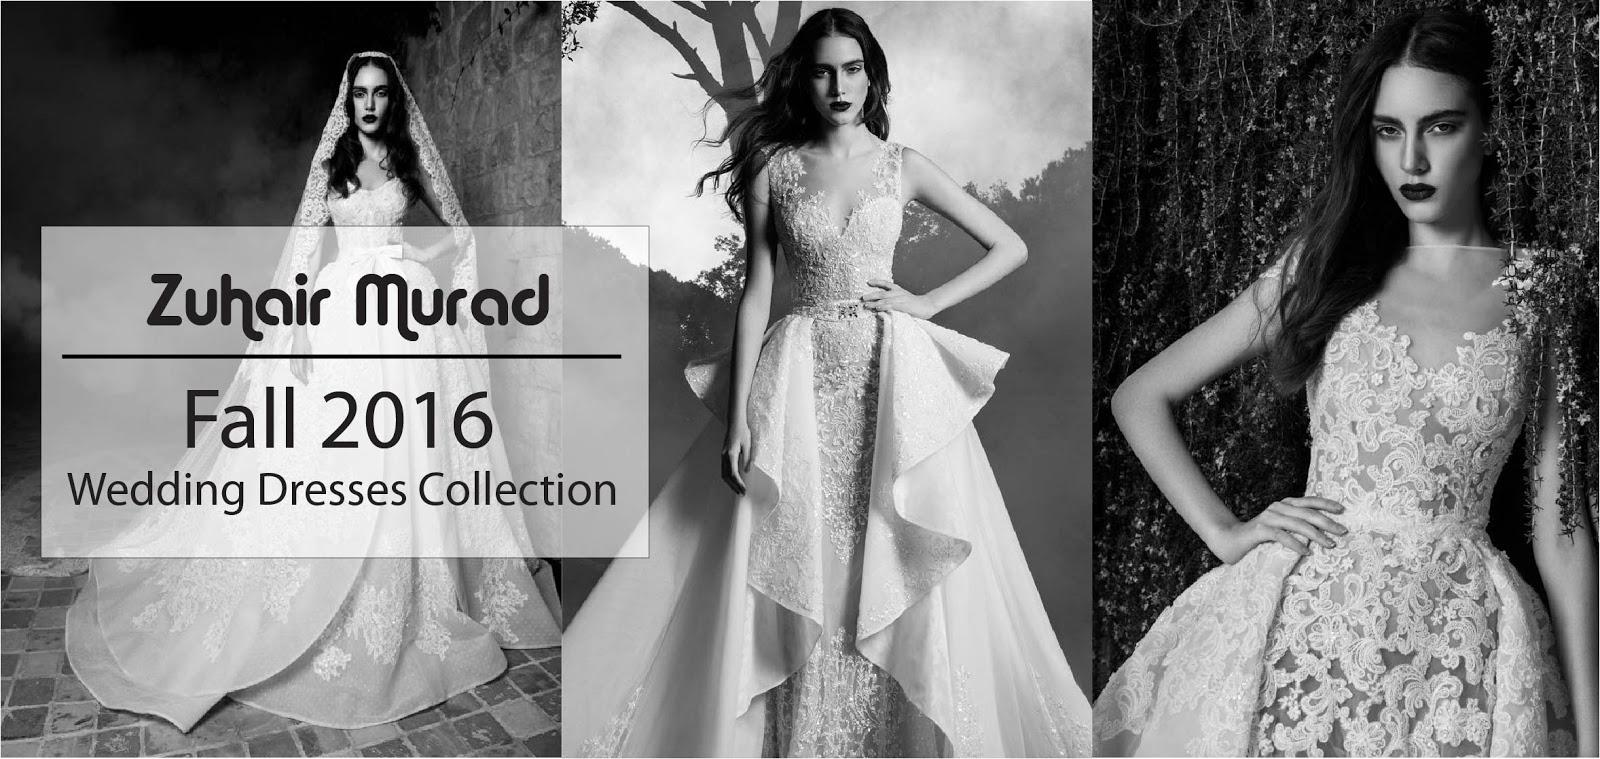 Zuhair Murad Wedding Gown 78 Fresh Zuhair Murad salah satu